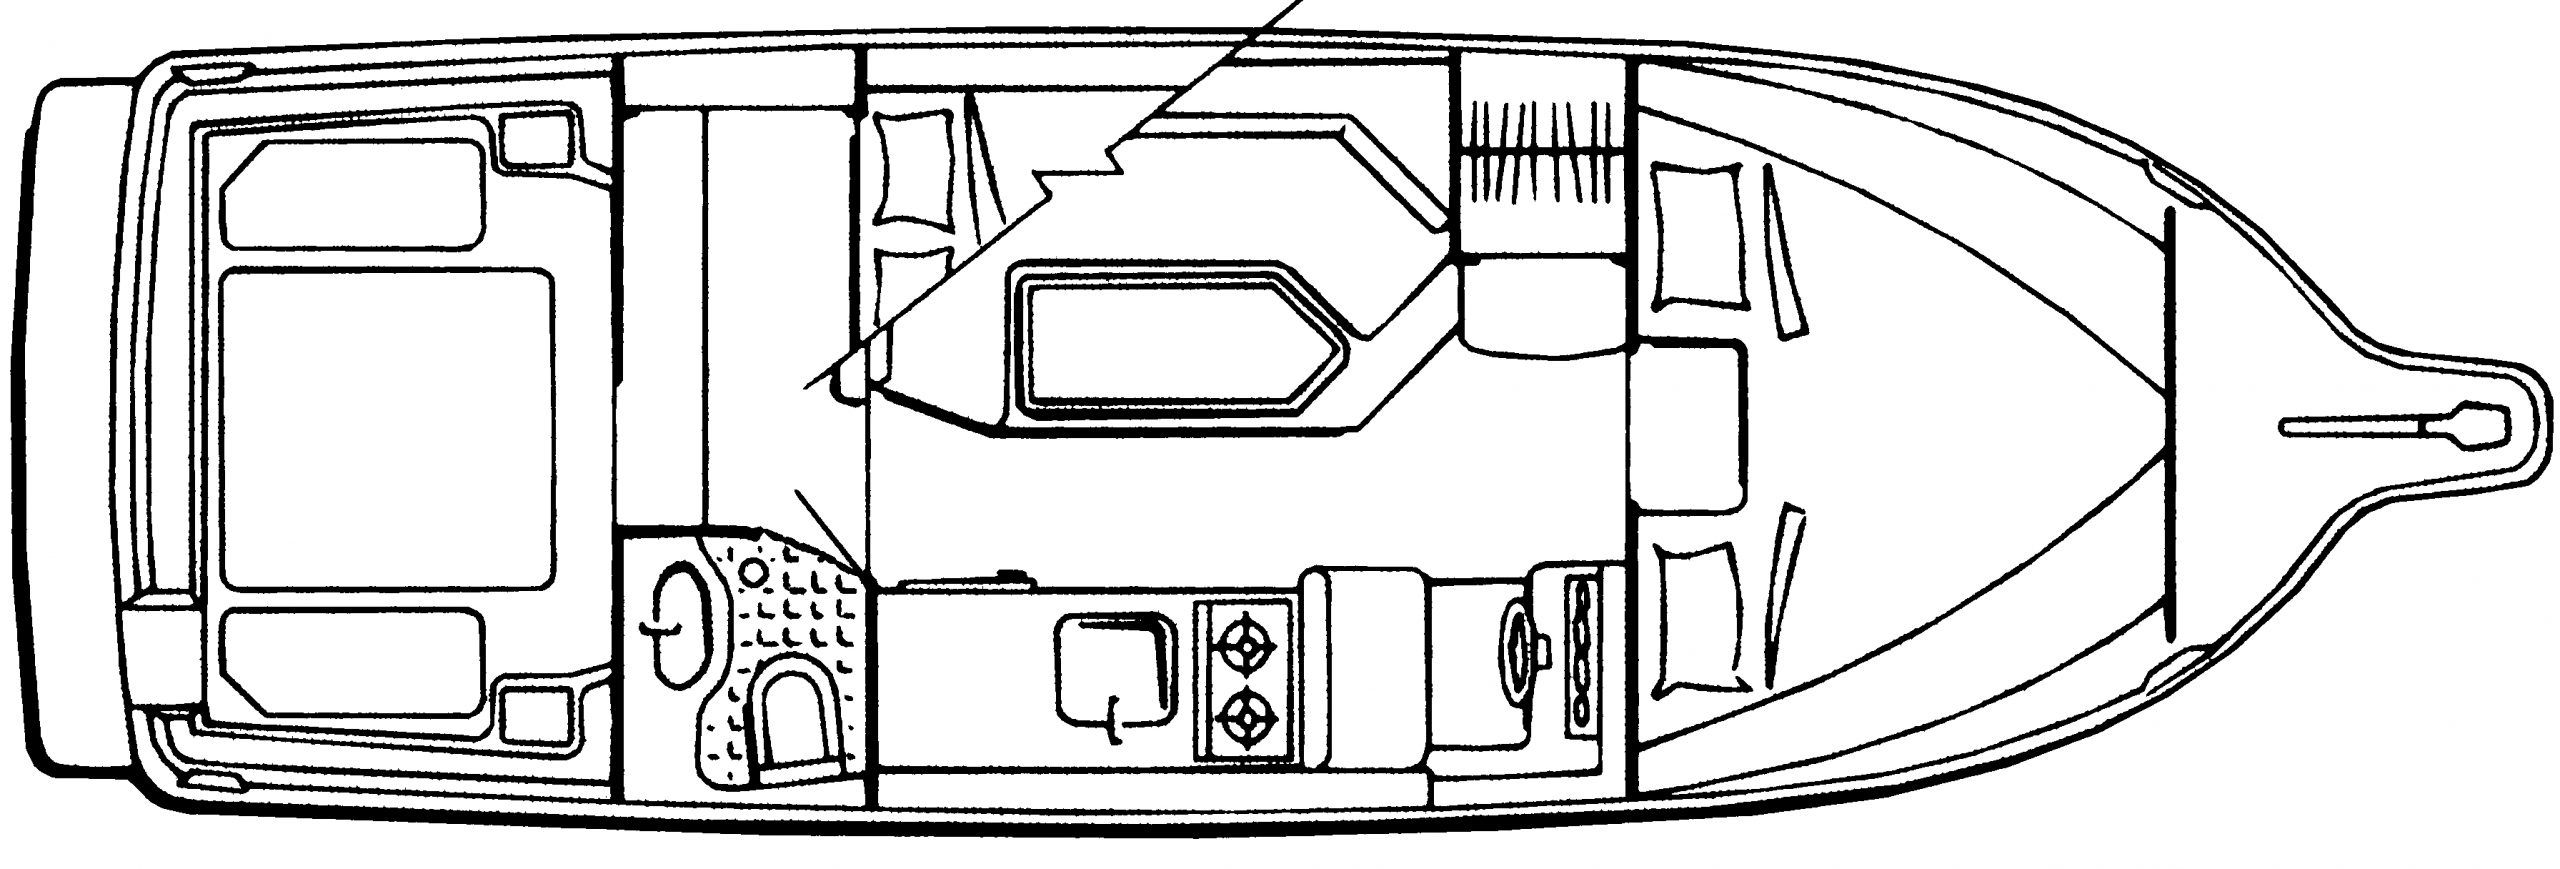 2858 Ciera CB; 288 Classic Cruiser Floor Plan 1